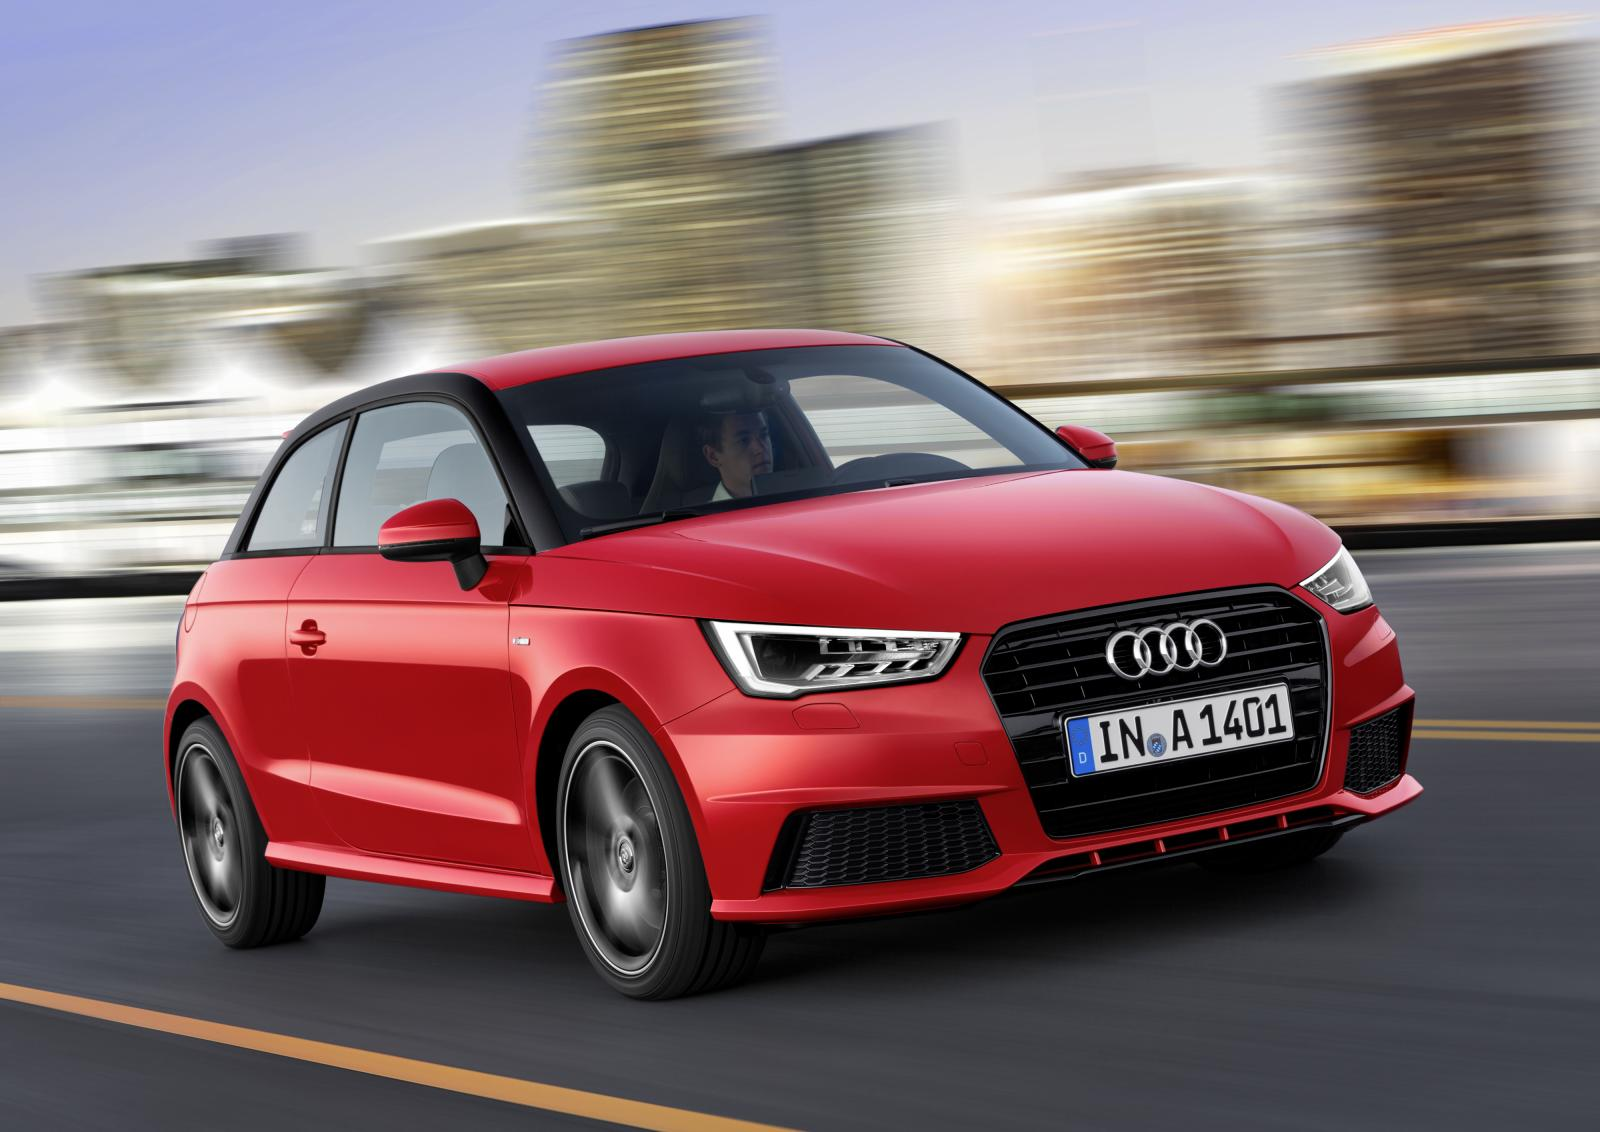 Audi A1 e Audi A1 Sportback 2015: dati tecnici e caratteristiche